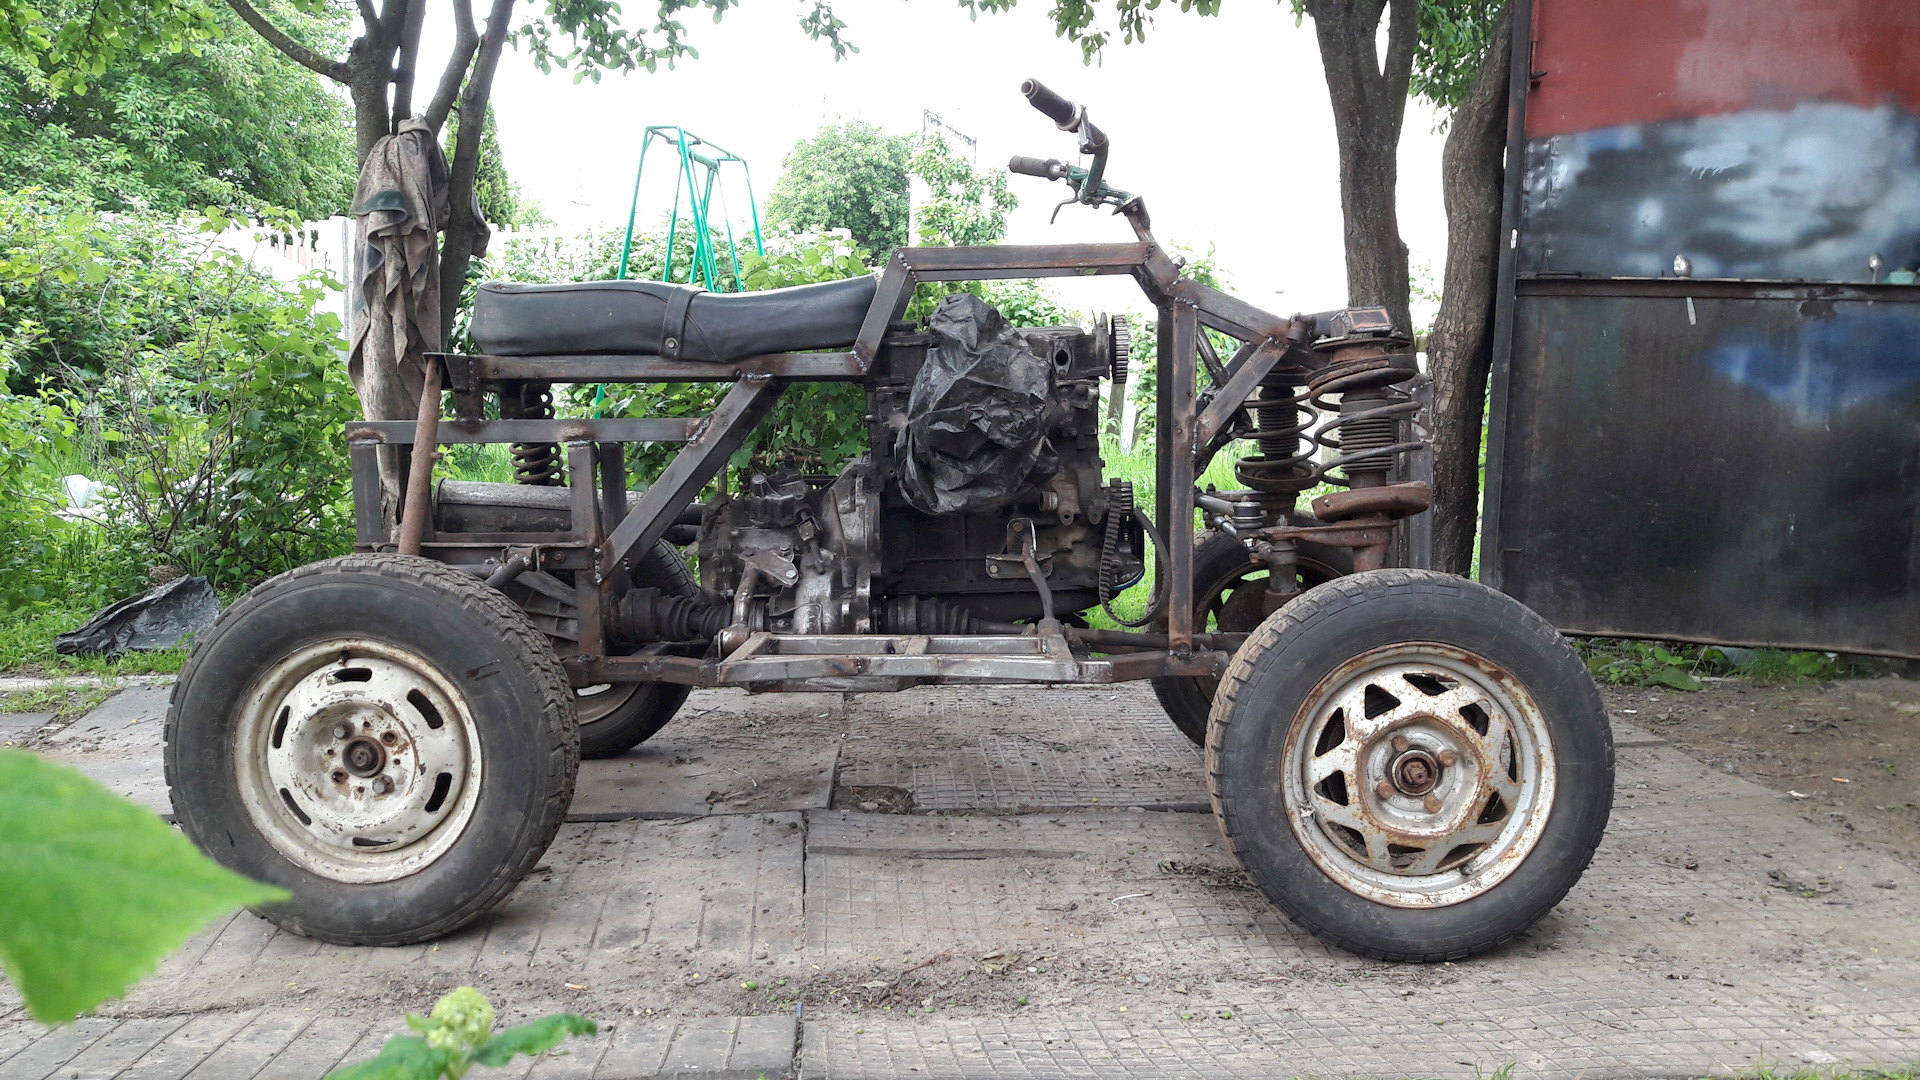 Чертежи квадроцикла на базе «Урала» - Квадроциклы 86